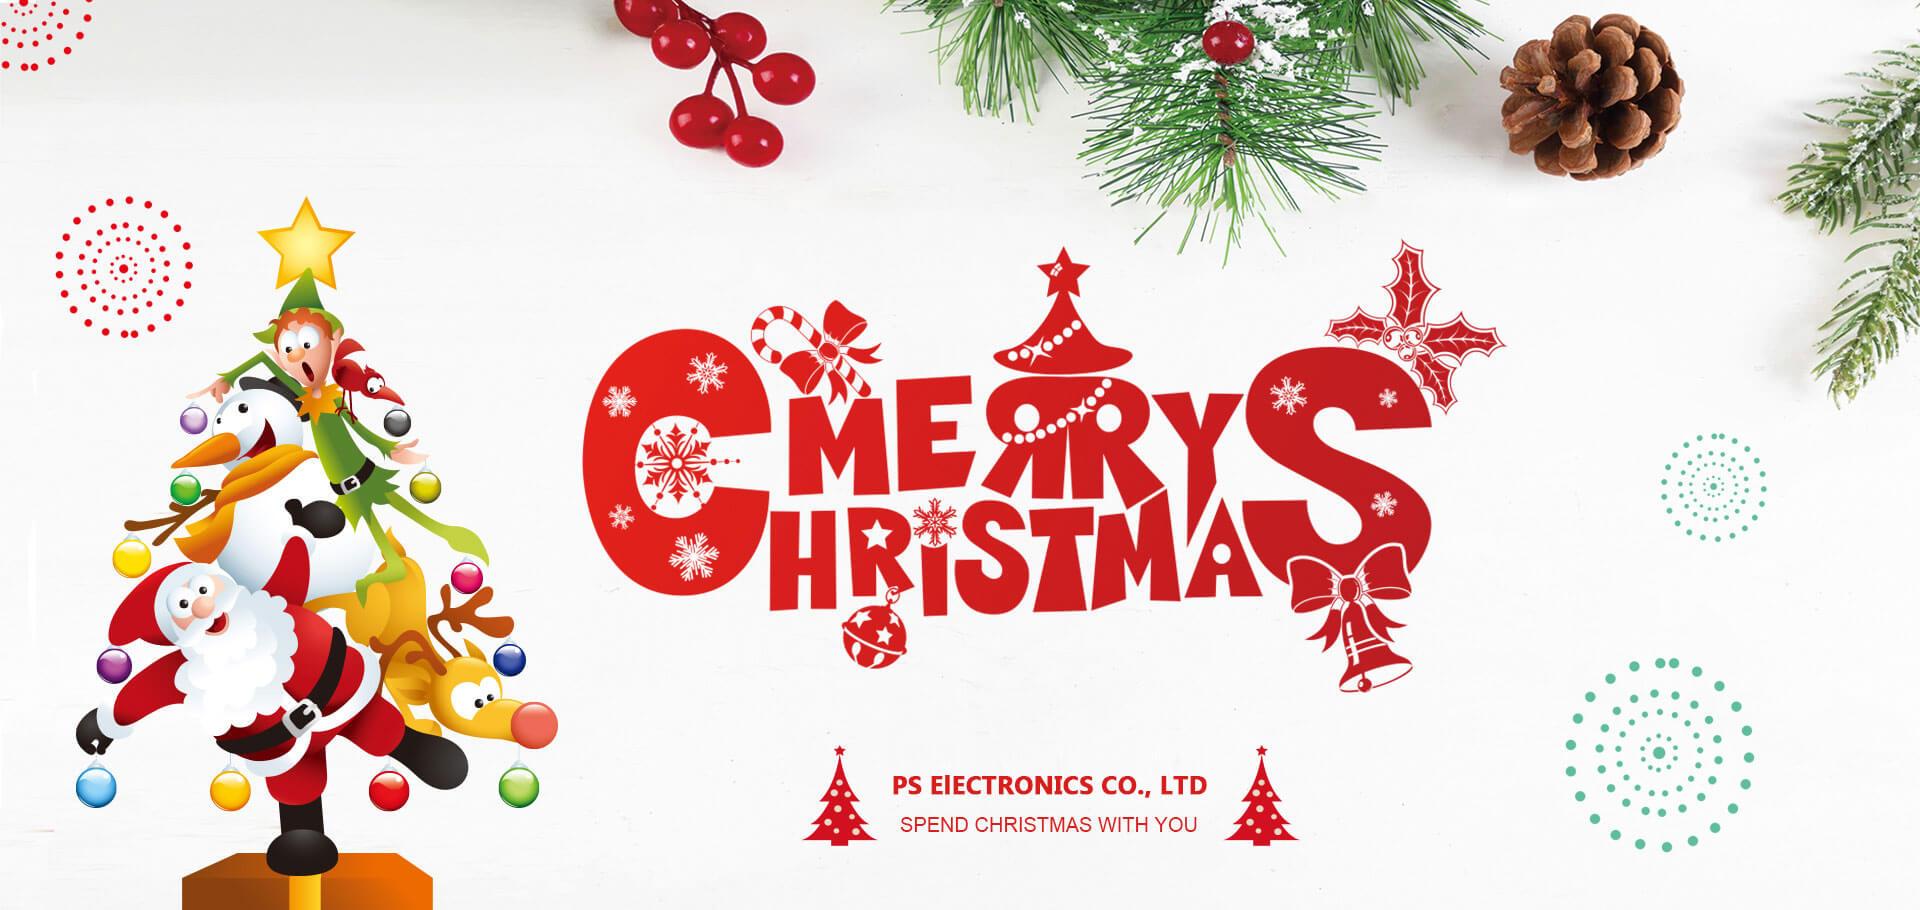 Happy Christmas 2020 | PS Electronics